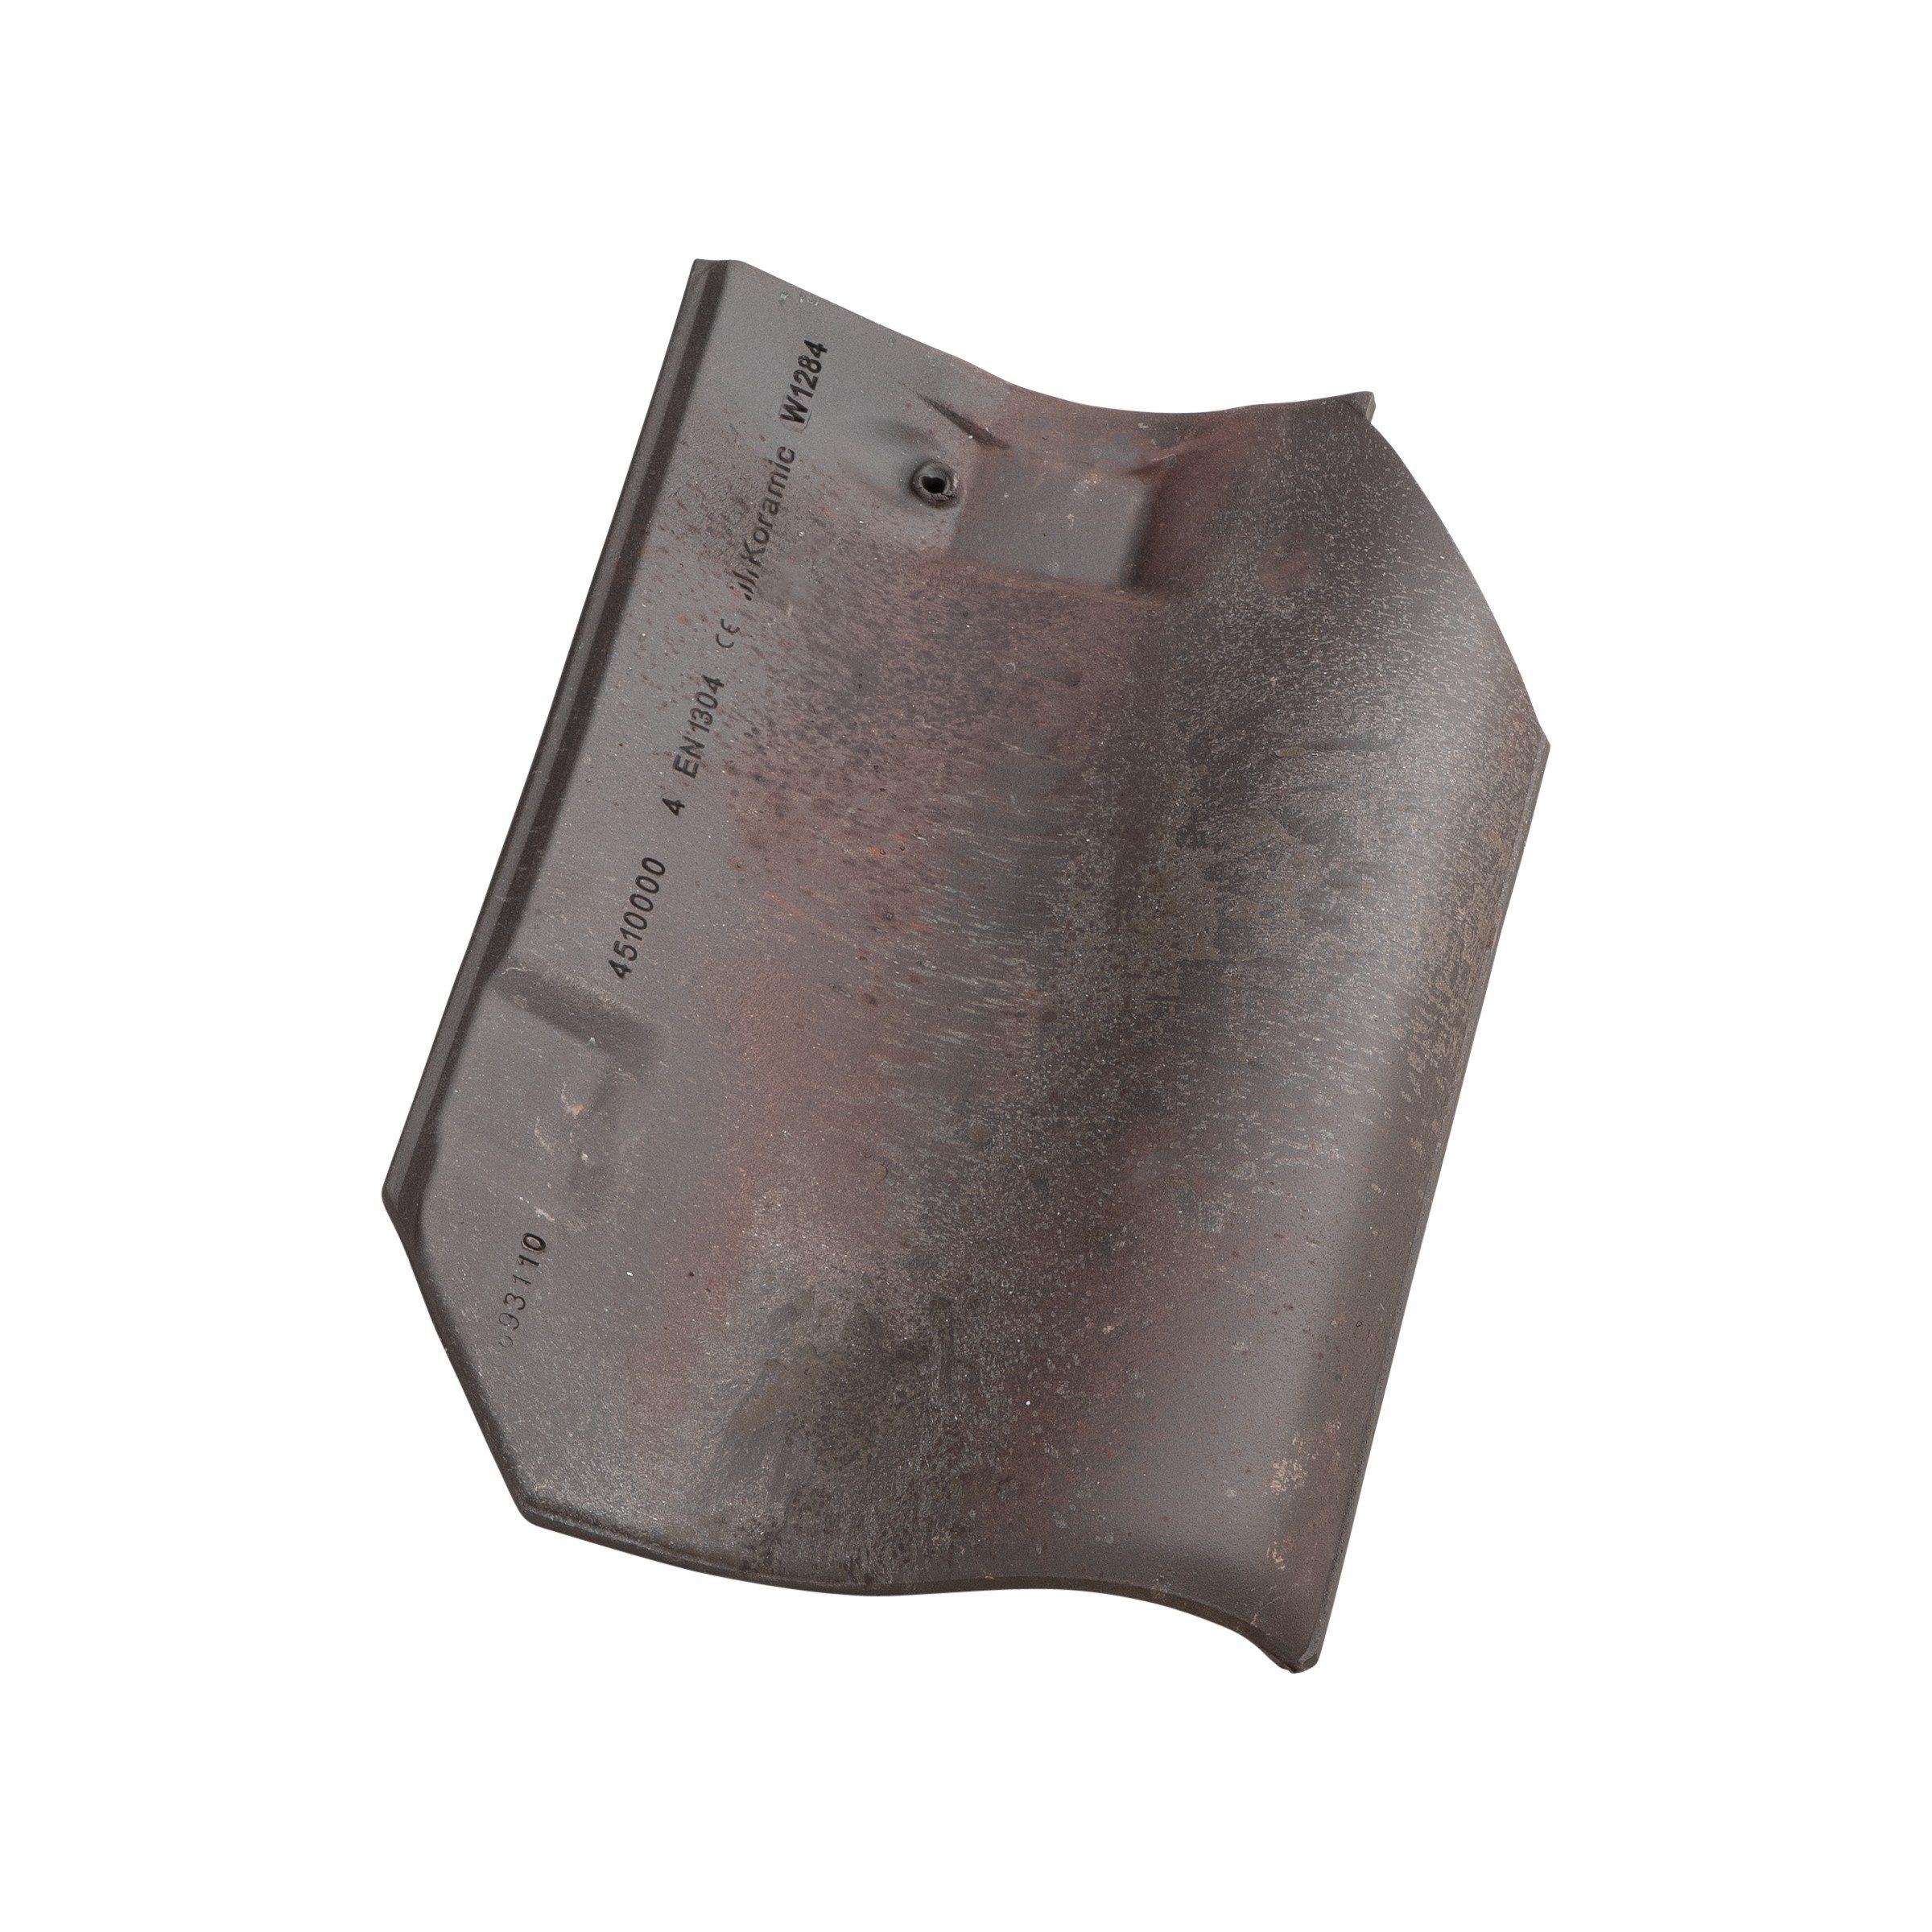 Koramic Ovh Vario Natuurrood Dakpan: Koramic OVH Vario